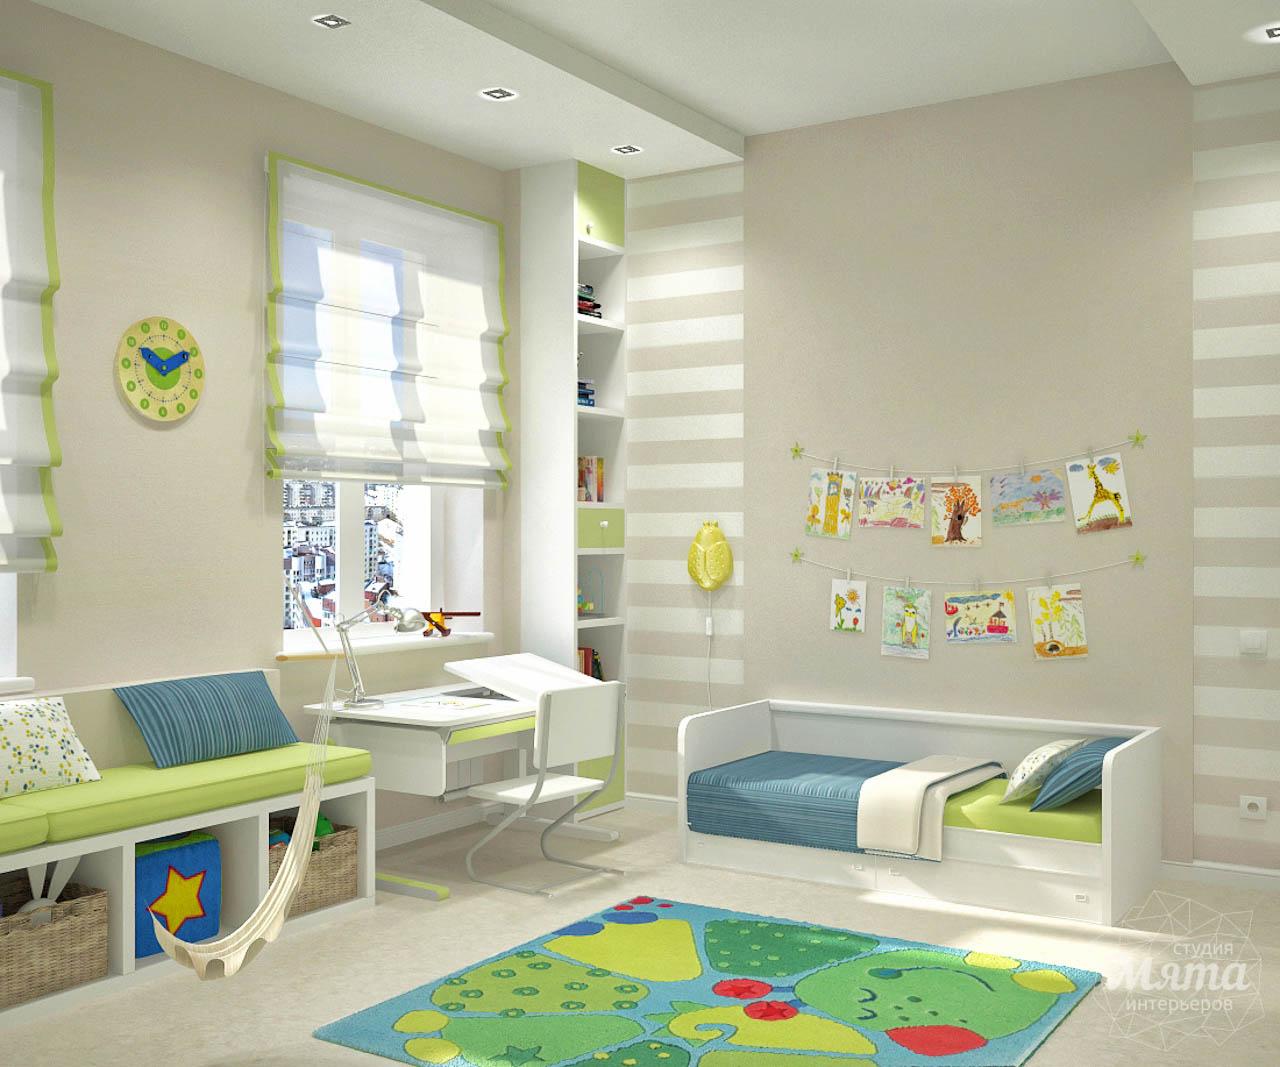 Дизайн интерьера и ремонт трехкомнатной квартиры по ул. Чкалова 124 img984355086